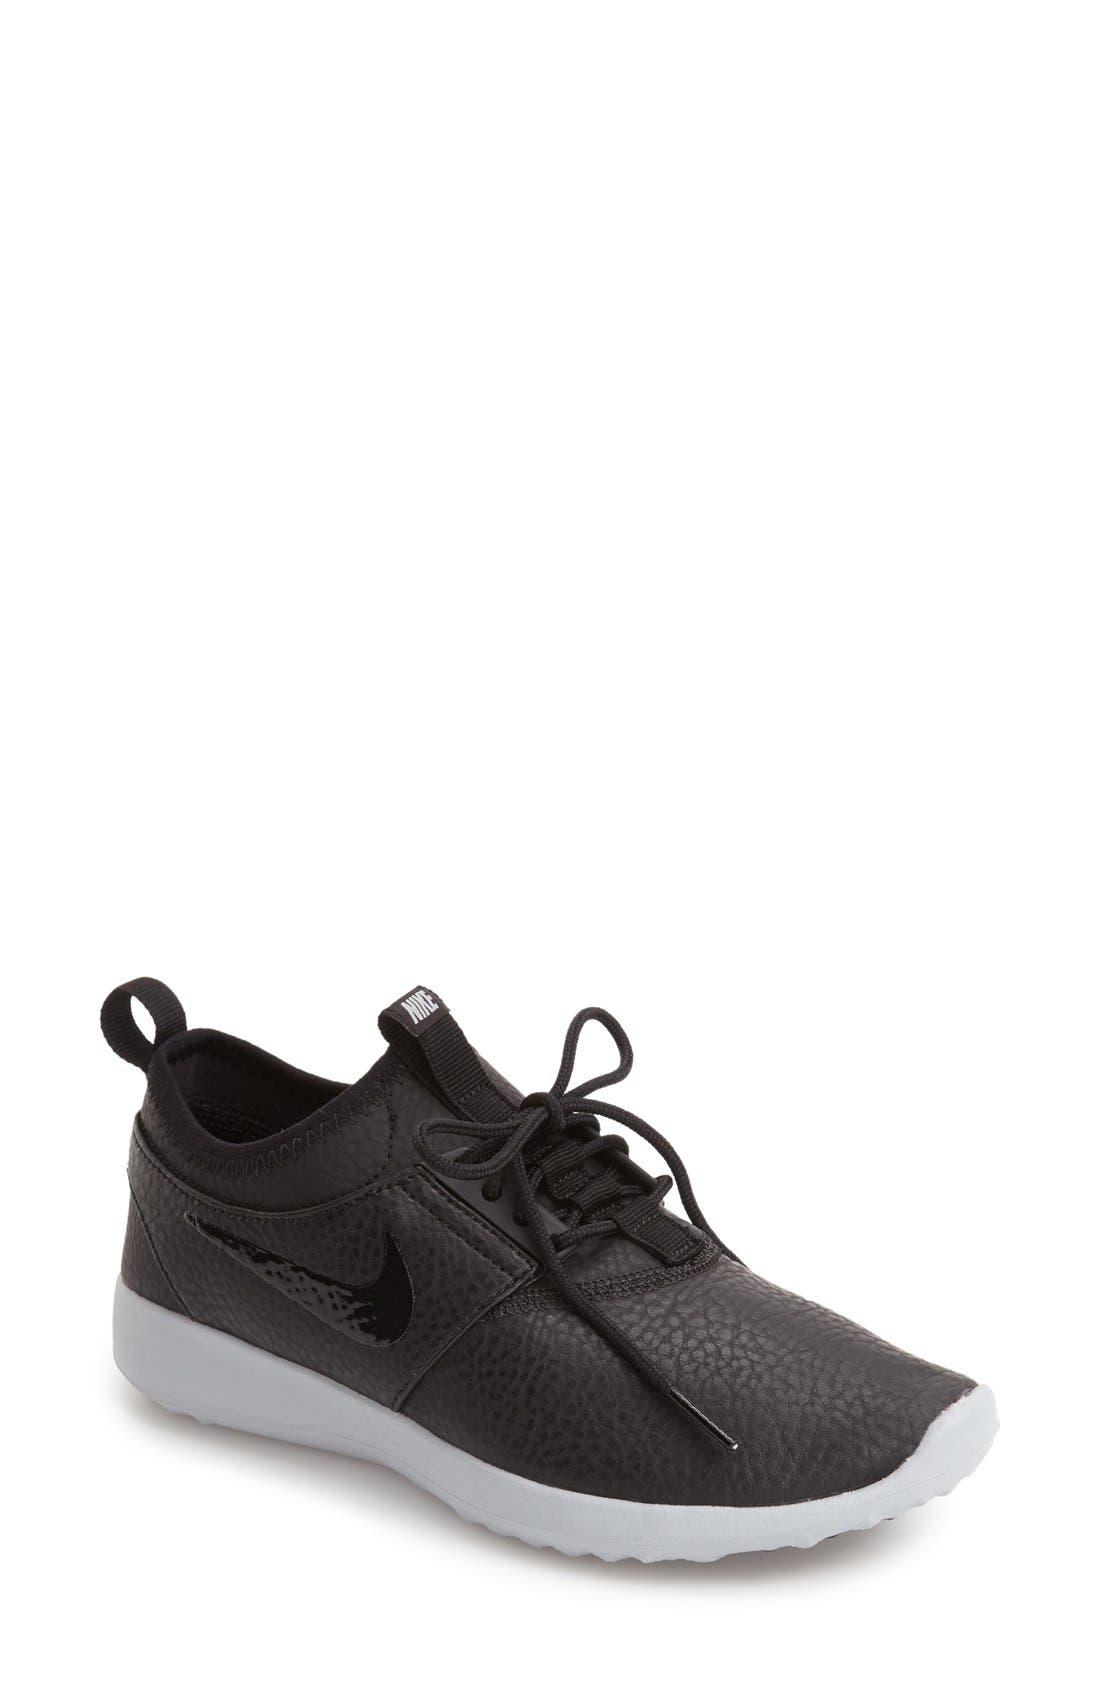 Alternate Image 1 Selected - Nike 'Juvenate' Sneaker (Women)